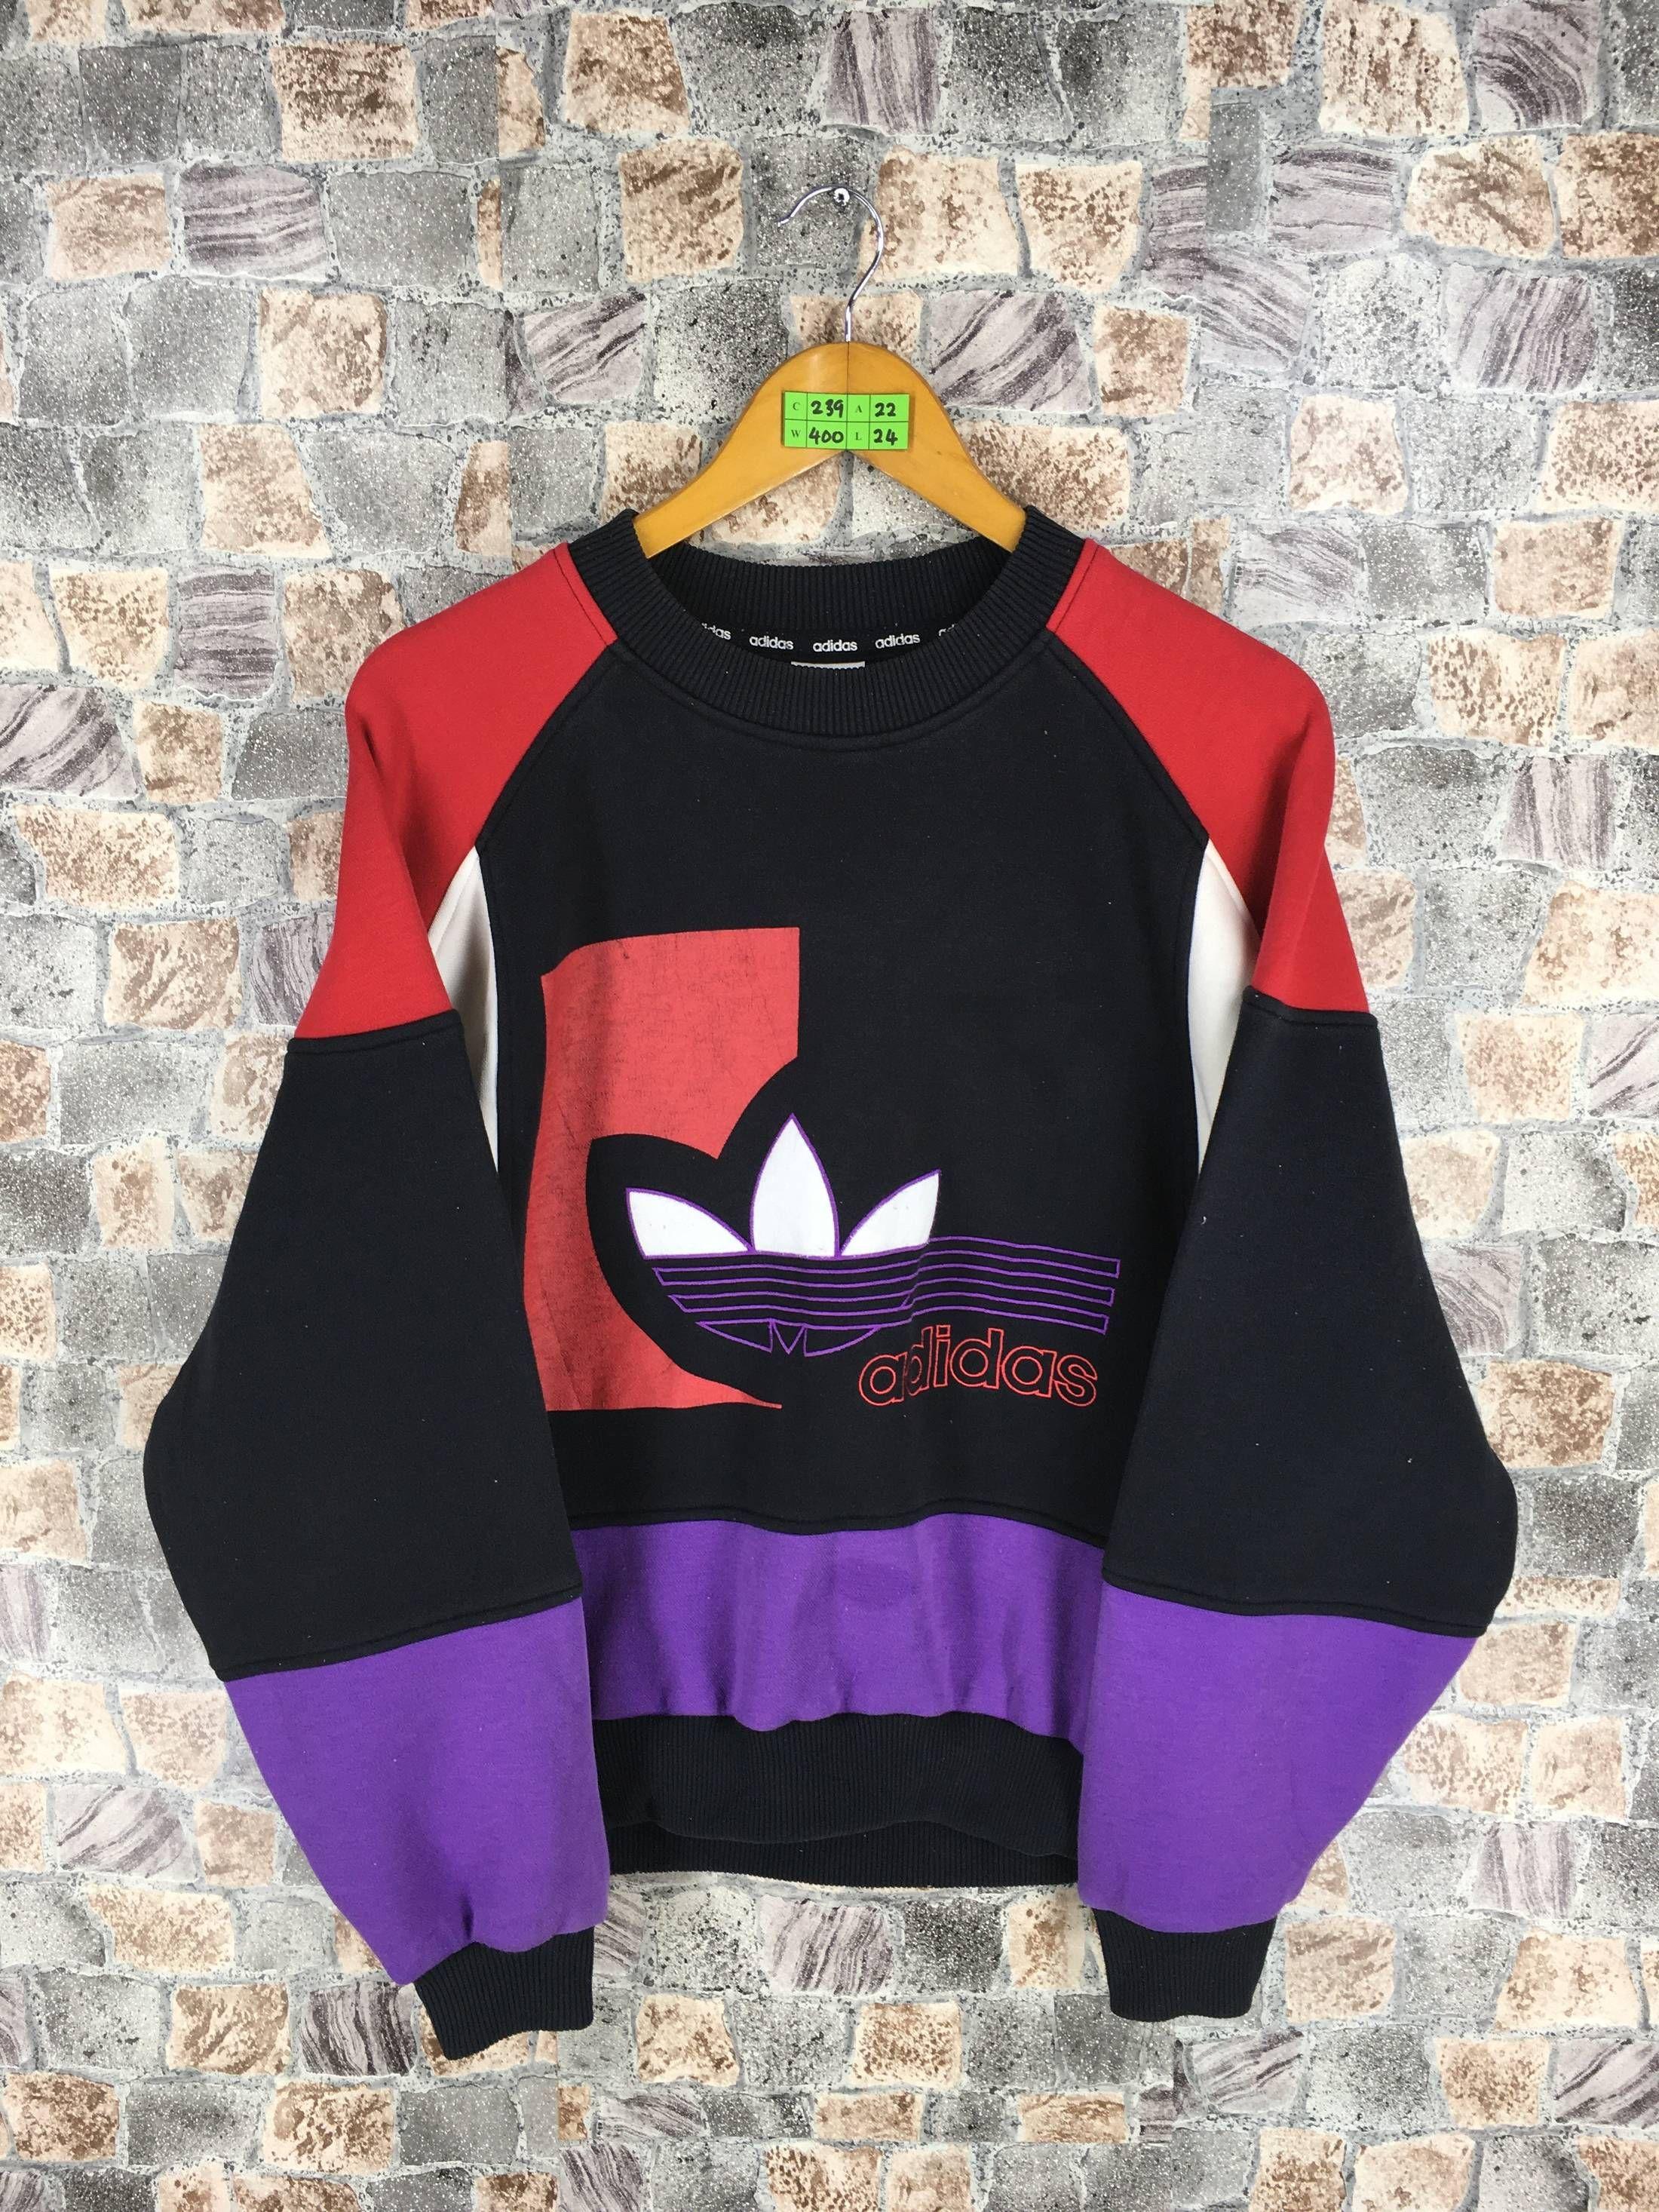 Adidas Adidas Run Dmc Sweatshirt Medium Vintage 80s Adidas Trefoil Big Logo Multicolour Jumper Hip Hop Adidas Three S Hoodie Fashion Retro Outfits Cool Outfits [ 2933 x 2200 Pixel ]